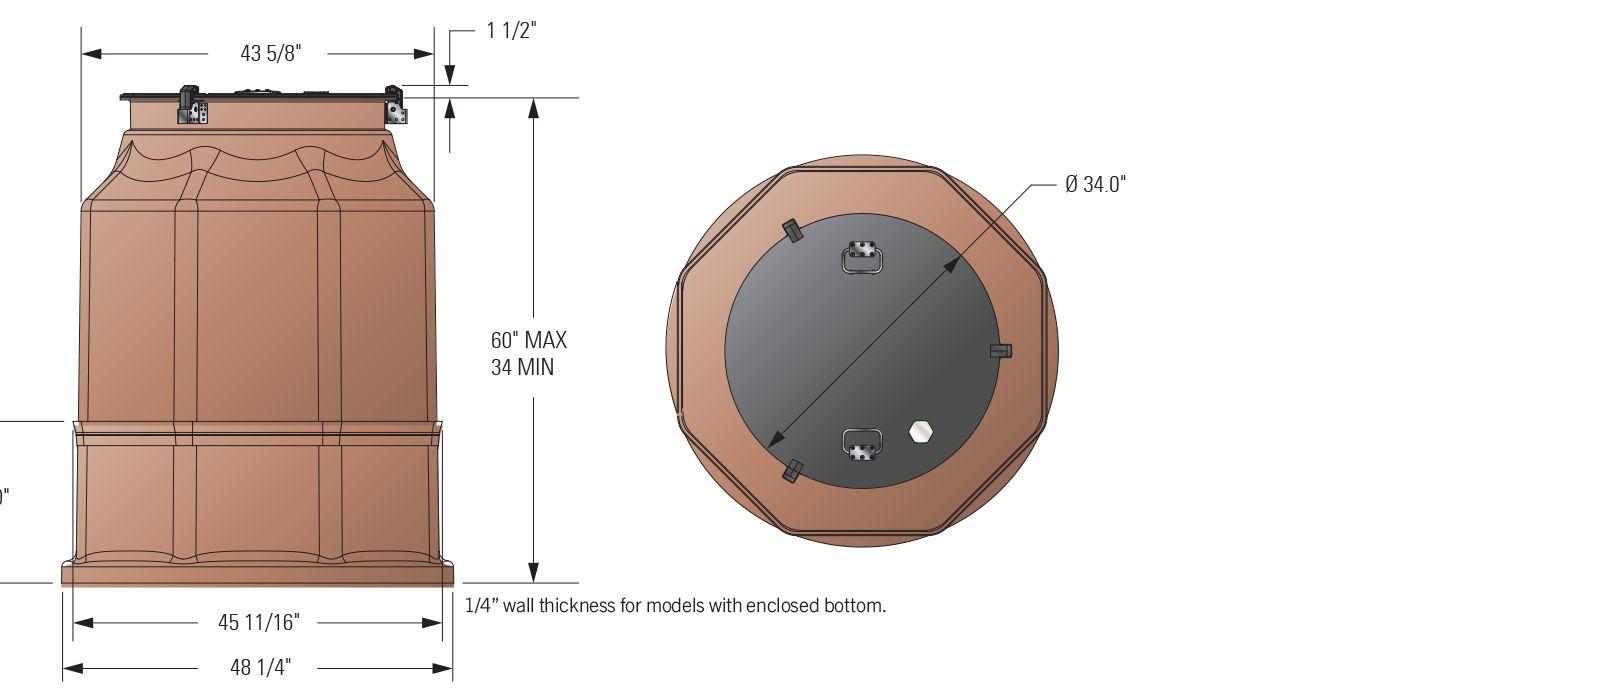 Watertight Tank Sump - 48 Inch - Dims.psd